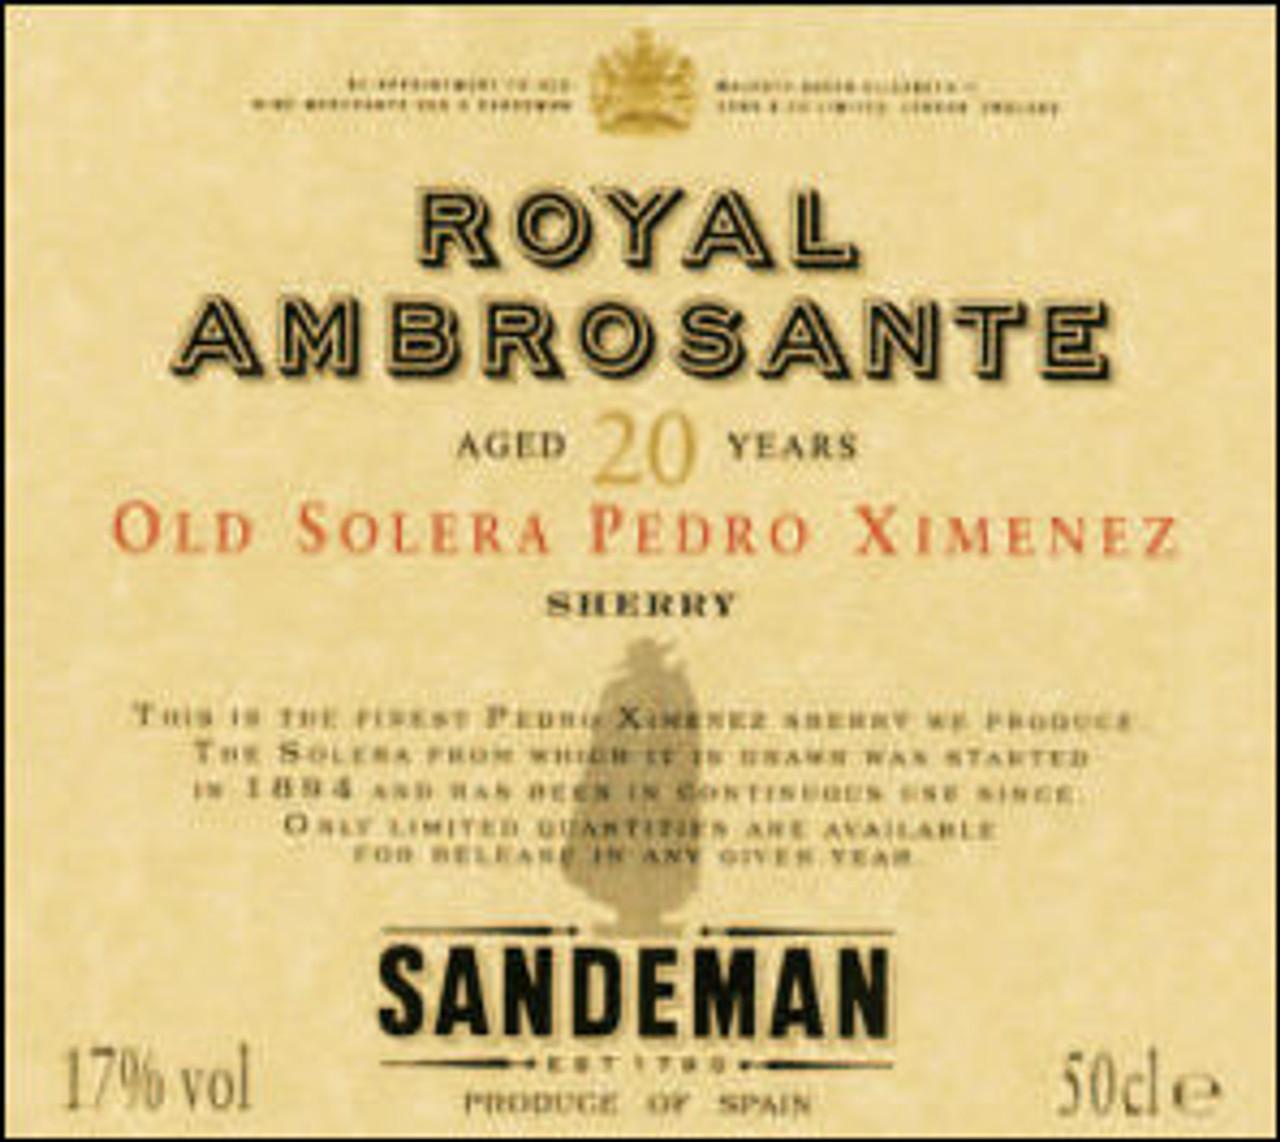 Sandeman Royal Ambrosante 20 Years Old Solera Pedro Ximenez Sherry 500ML